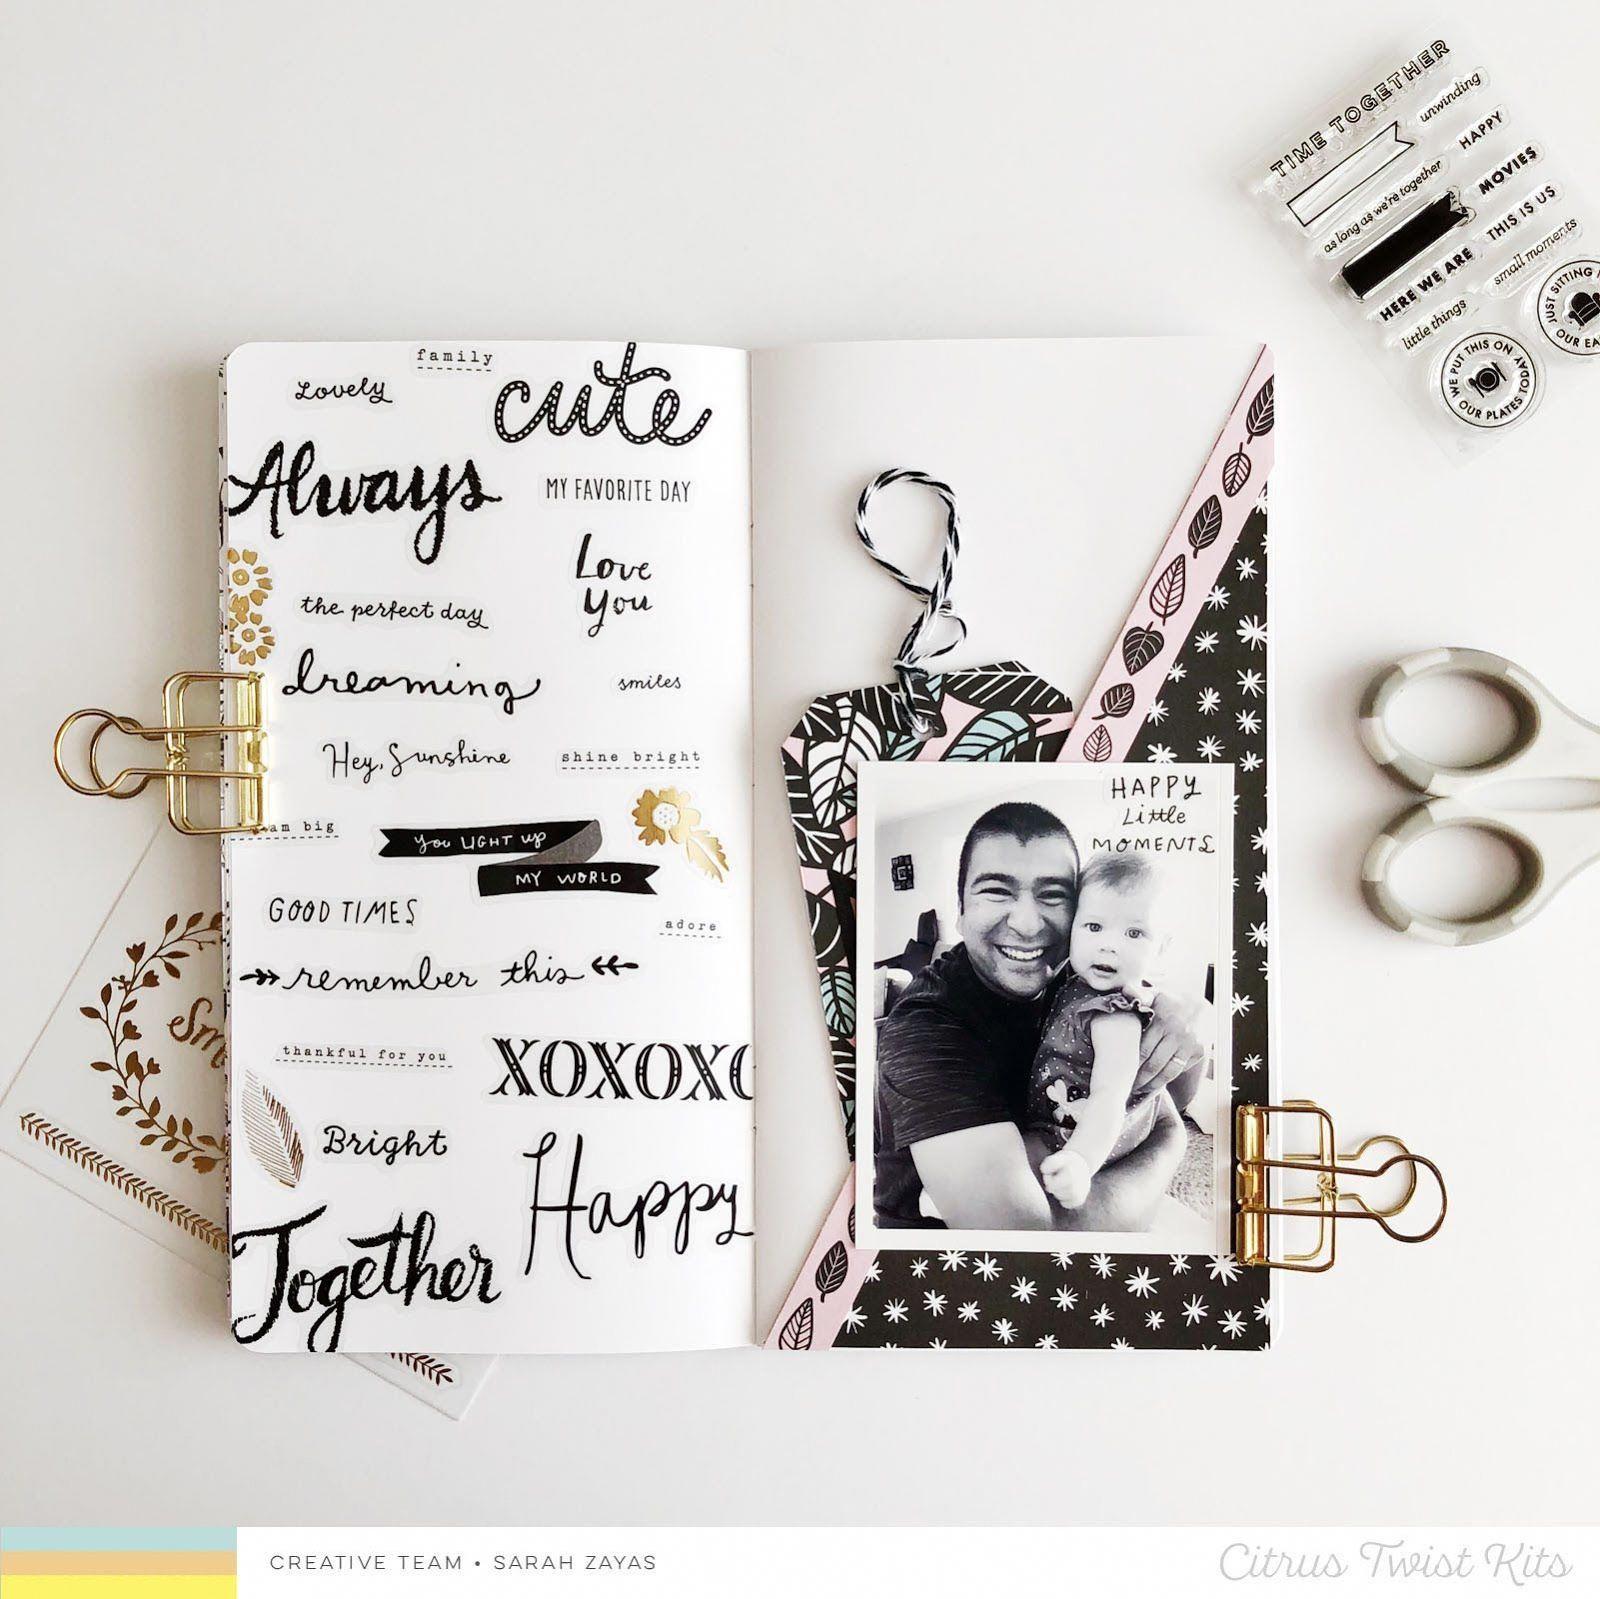 Citrus Twist Kits | Blog : 3-To-Inspire with Sarah | Traveler's Notebook ................................................................